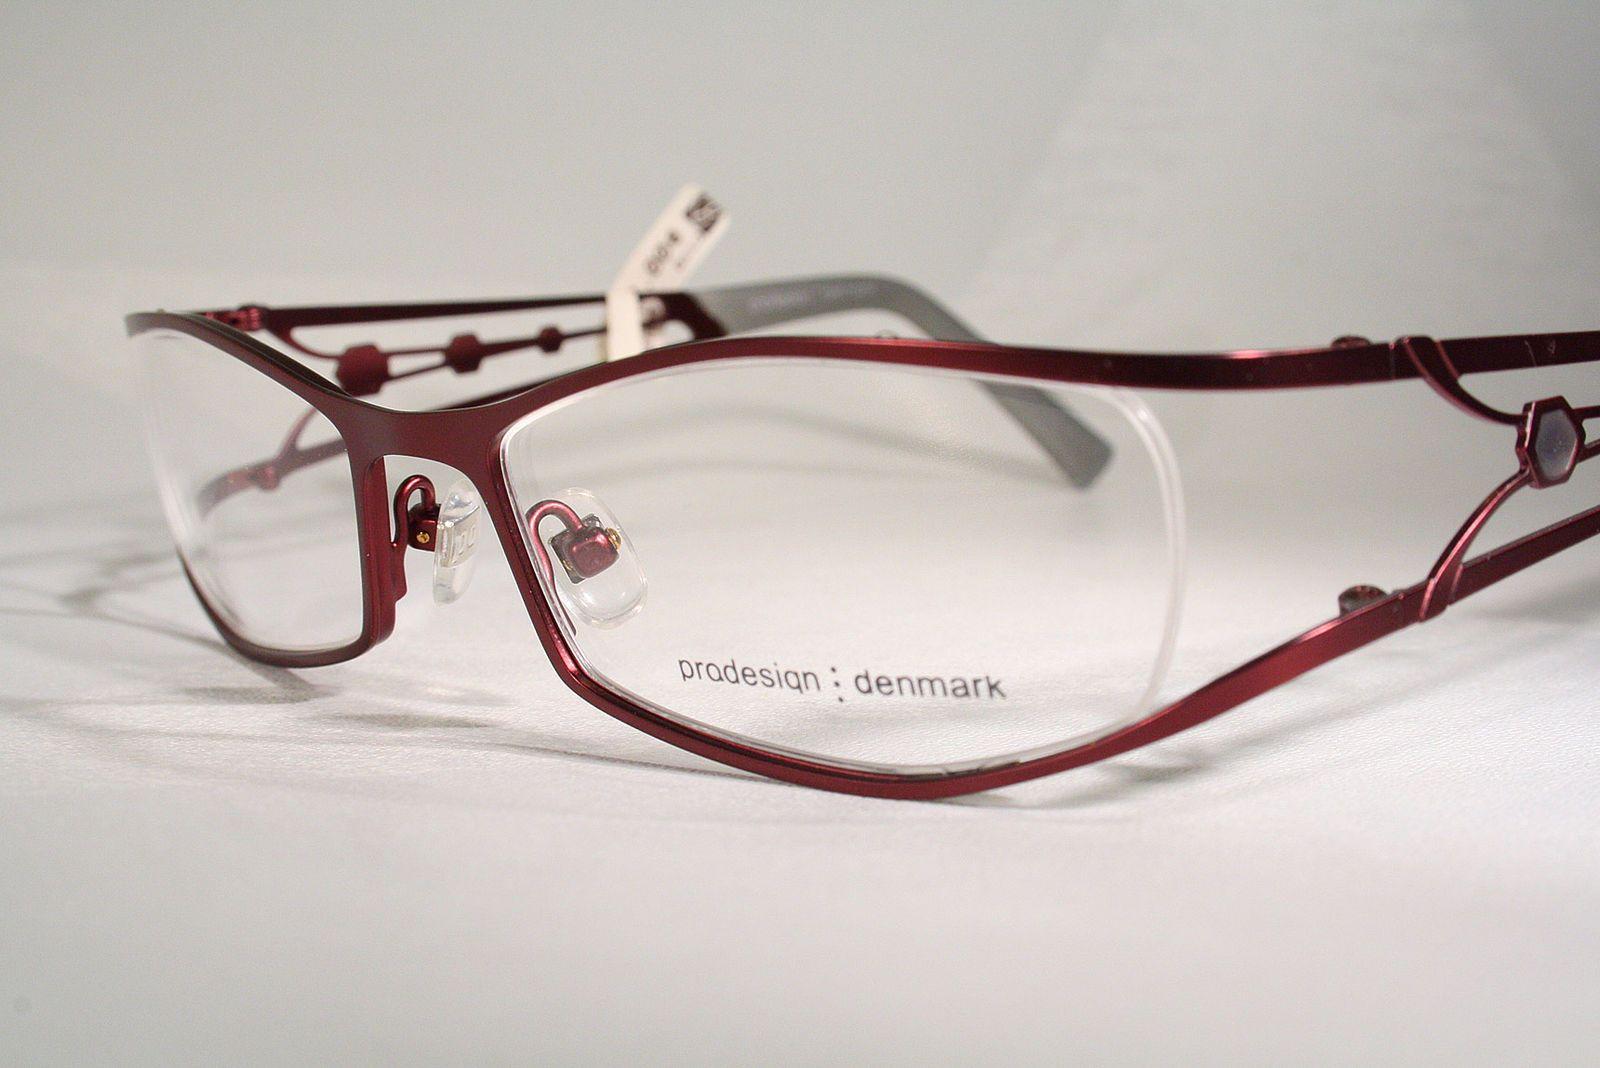 c24d0345f8f New PRODESIGN 5128 Satin Violet Purple Lilac Semi Rimless Womens Eyeglass  Frames